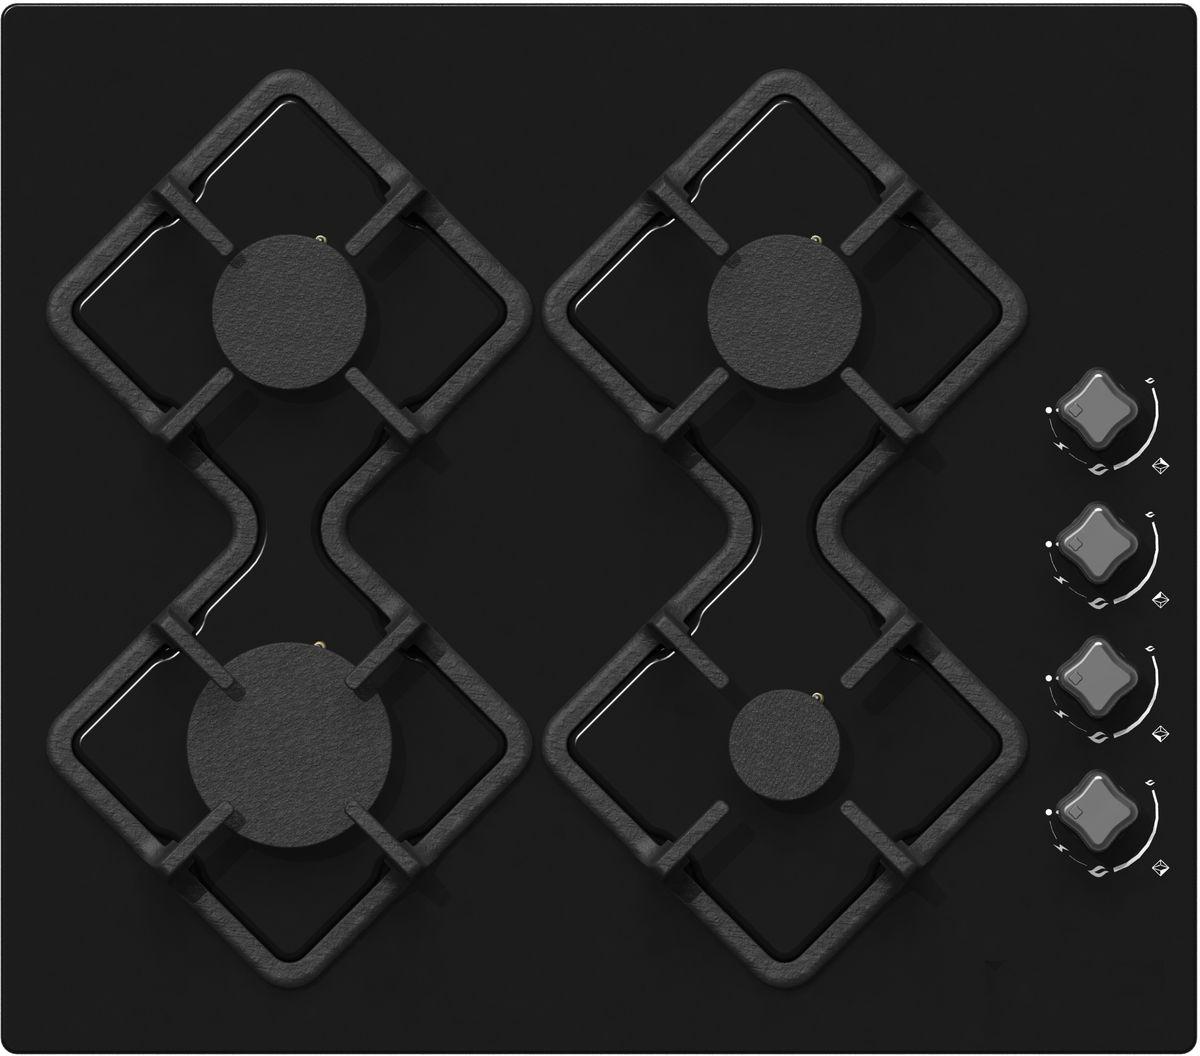 Ricci RGN-KA4007BL, Black варочная панель встраиваемая